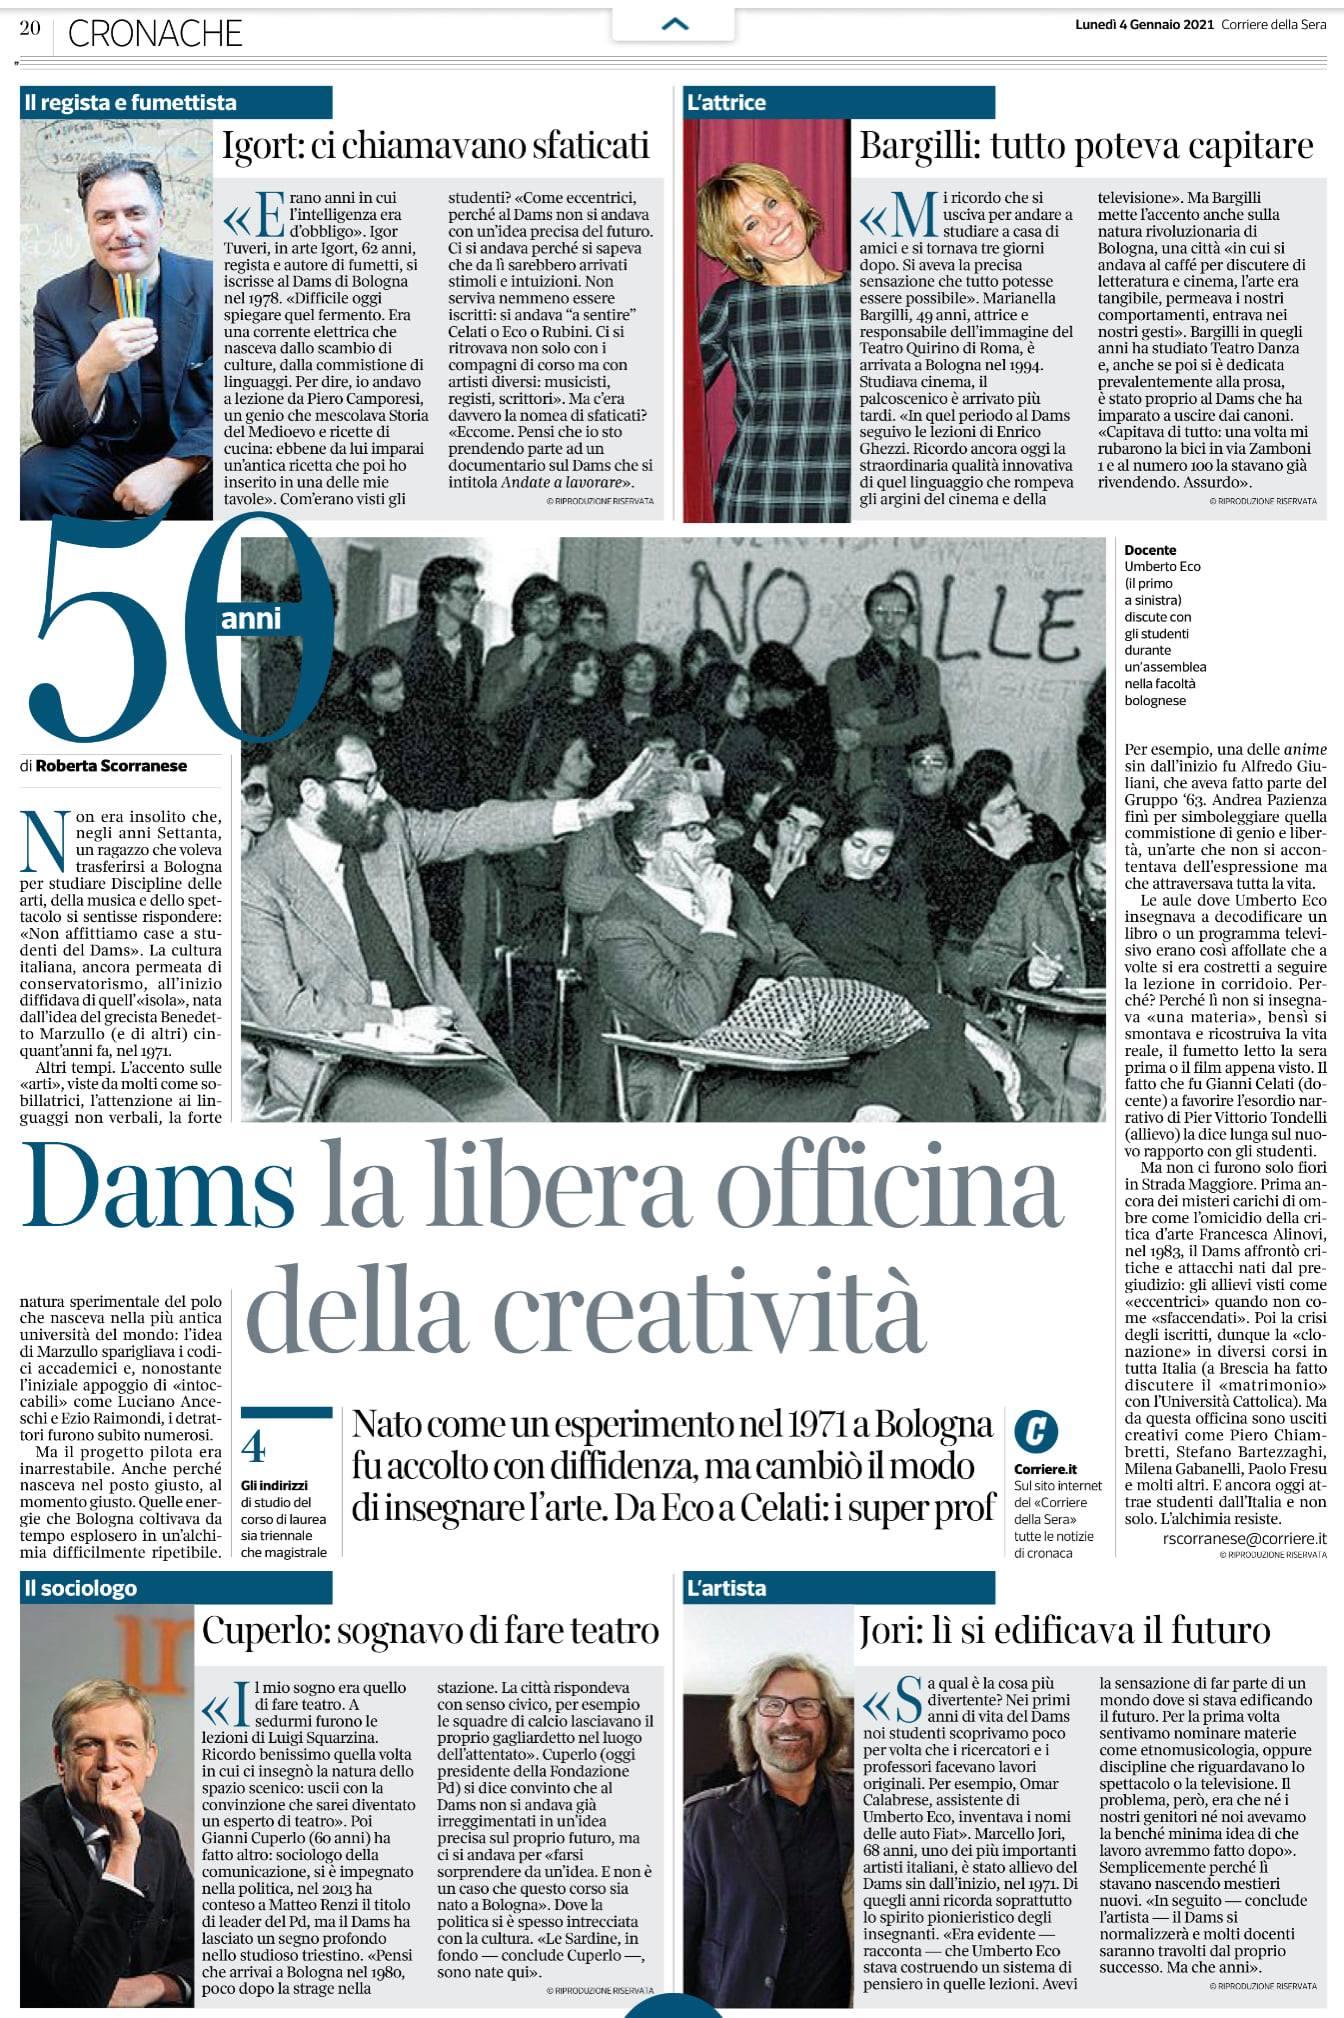 Dams 50 anni Corriere